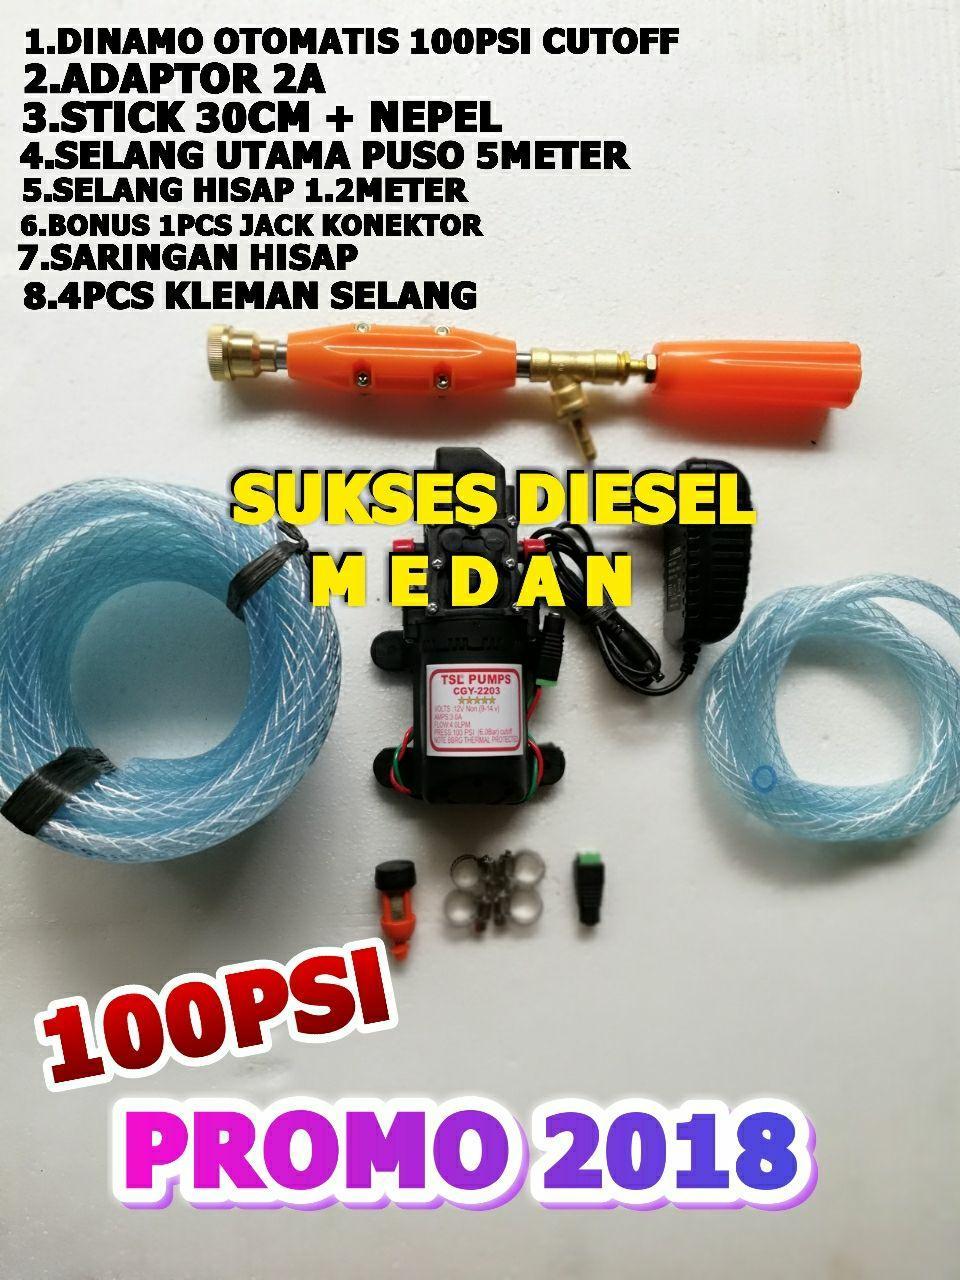 Alat Cuci Motor Mobil AC Jetcleaner Mesin Cuci Steam Doorsmeer Mini 100psi